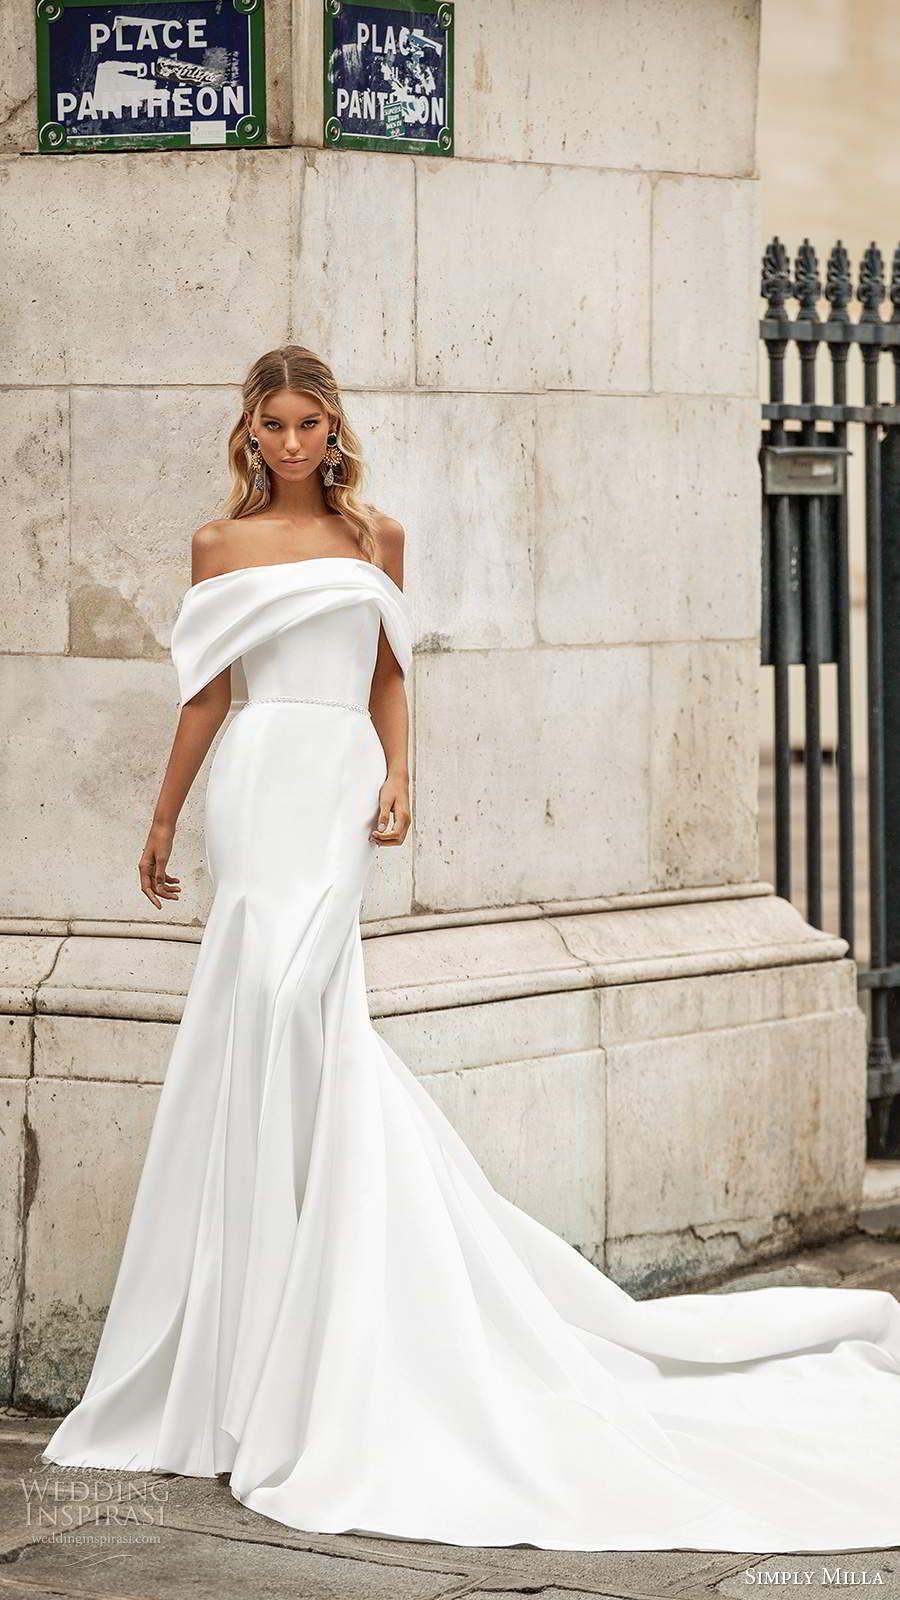 Milla Nova's Simply Milla 2020 Wedding Dresses   Wedding Inspirasi -   19 dress Wedding casamento ideas